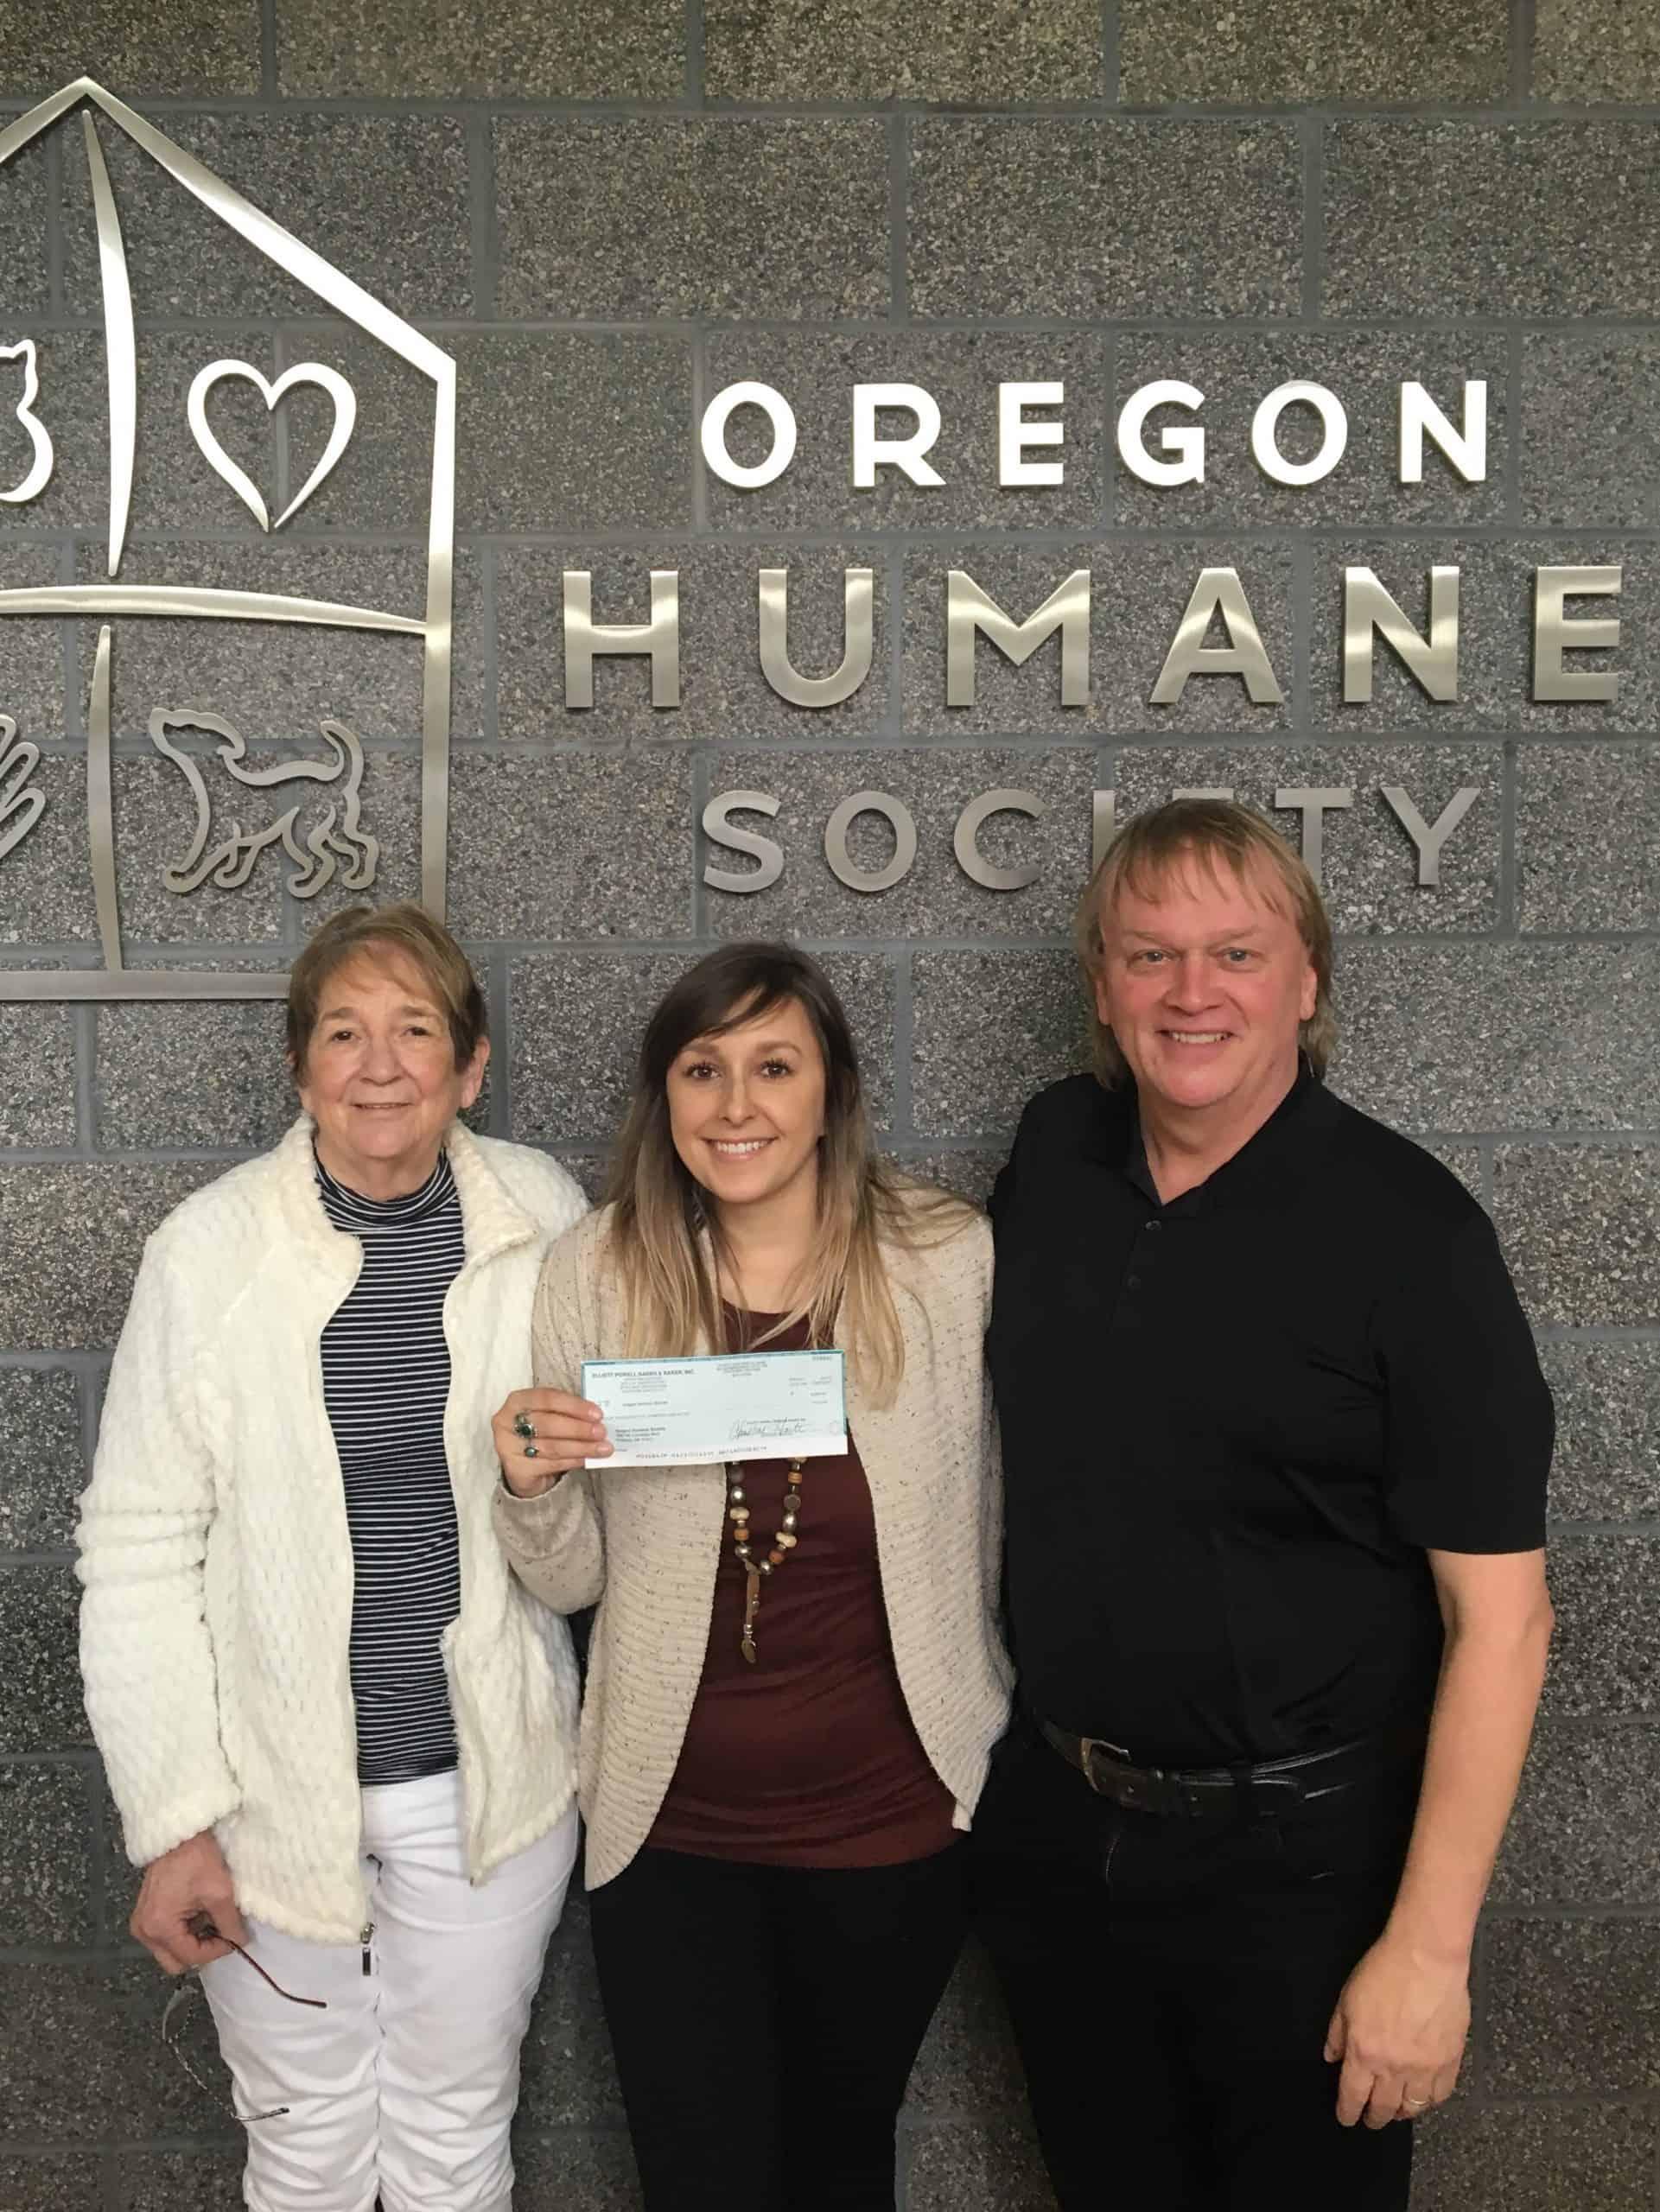 Oregon Humane